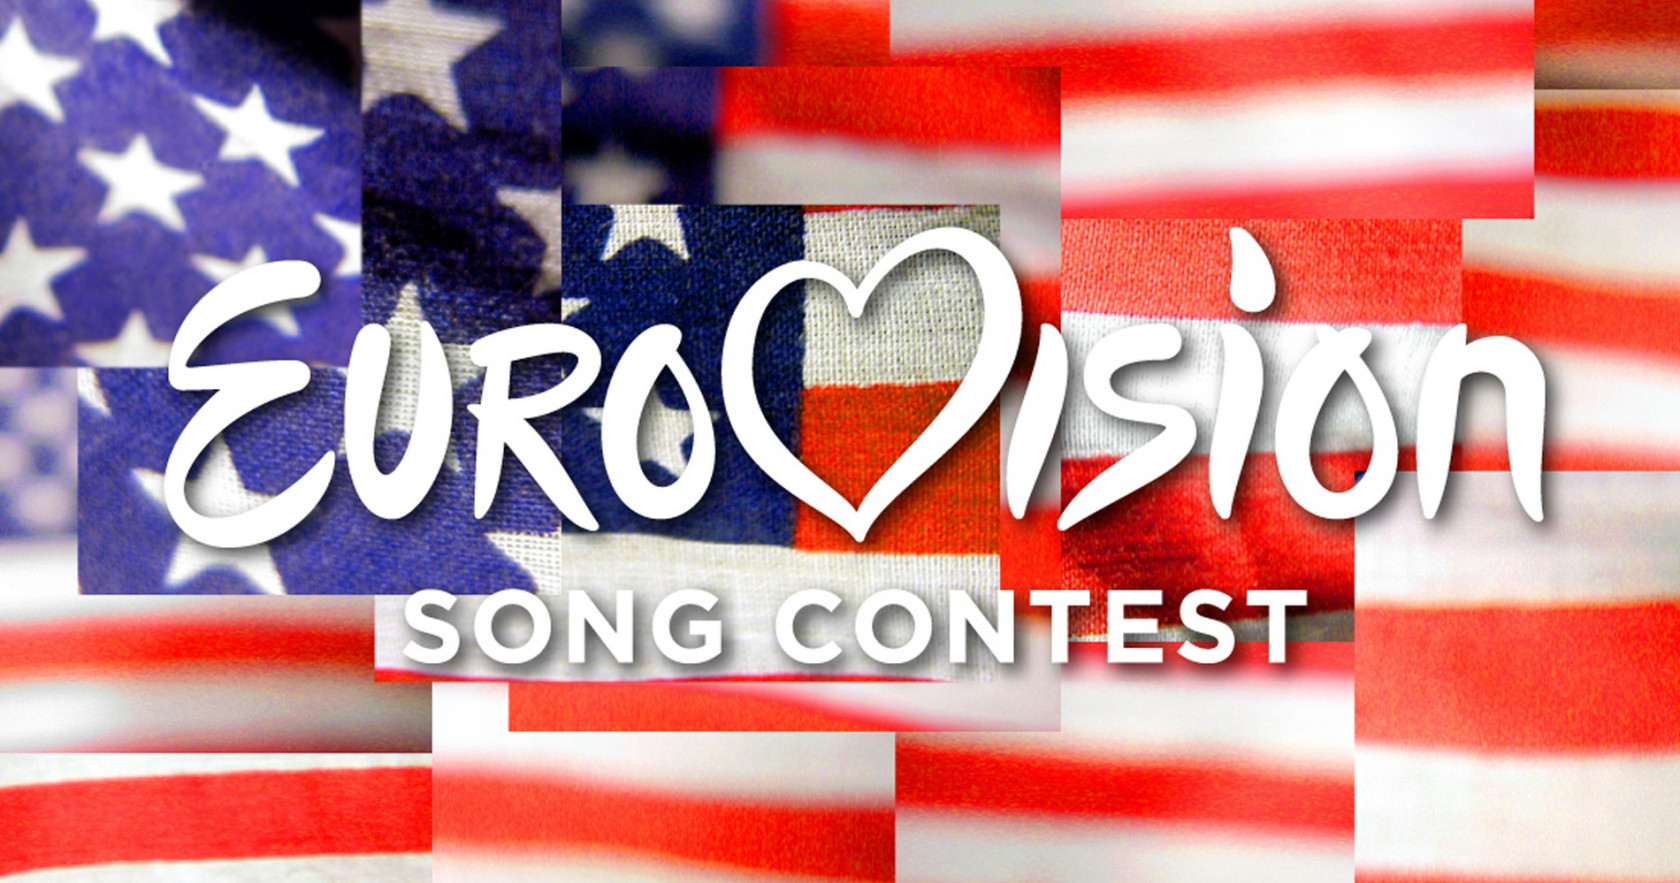 American Song Contest i Eurowizja